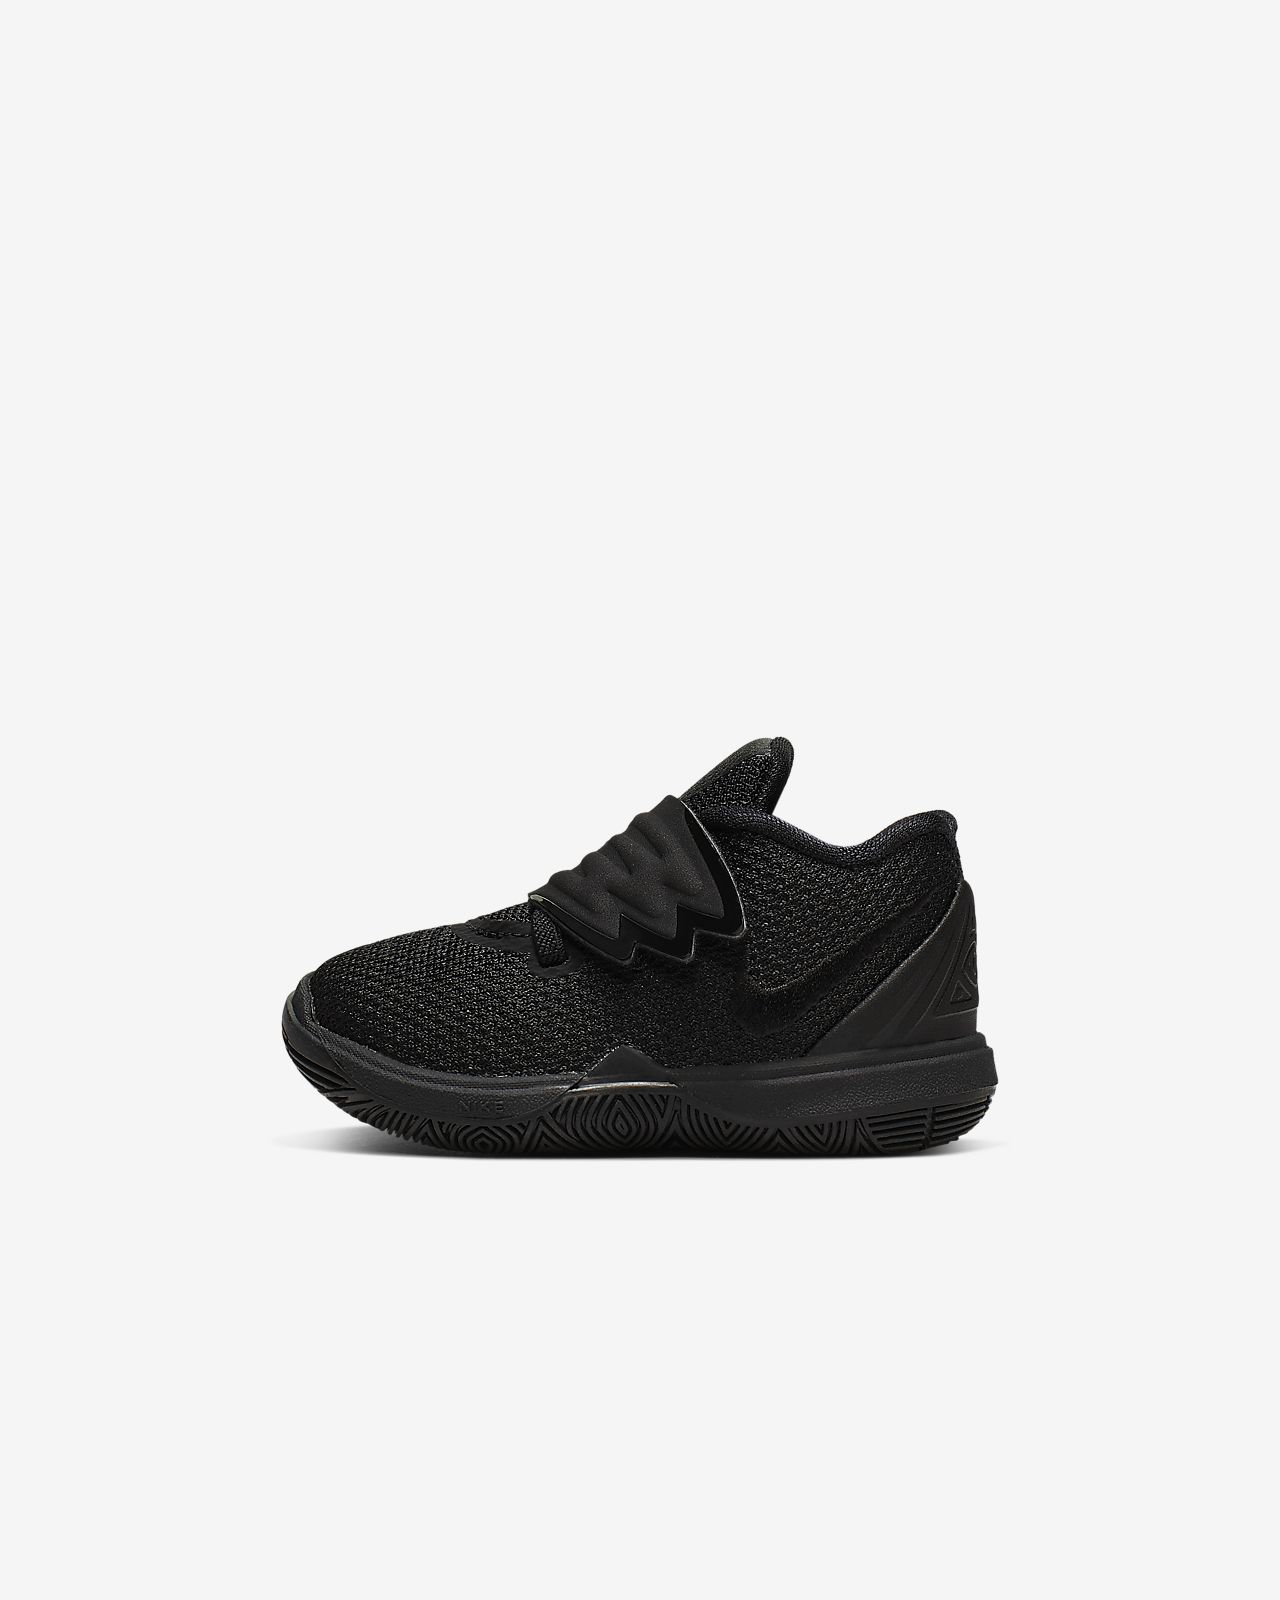 Kyrie 5 BabyToddler Shoe